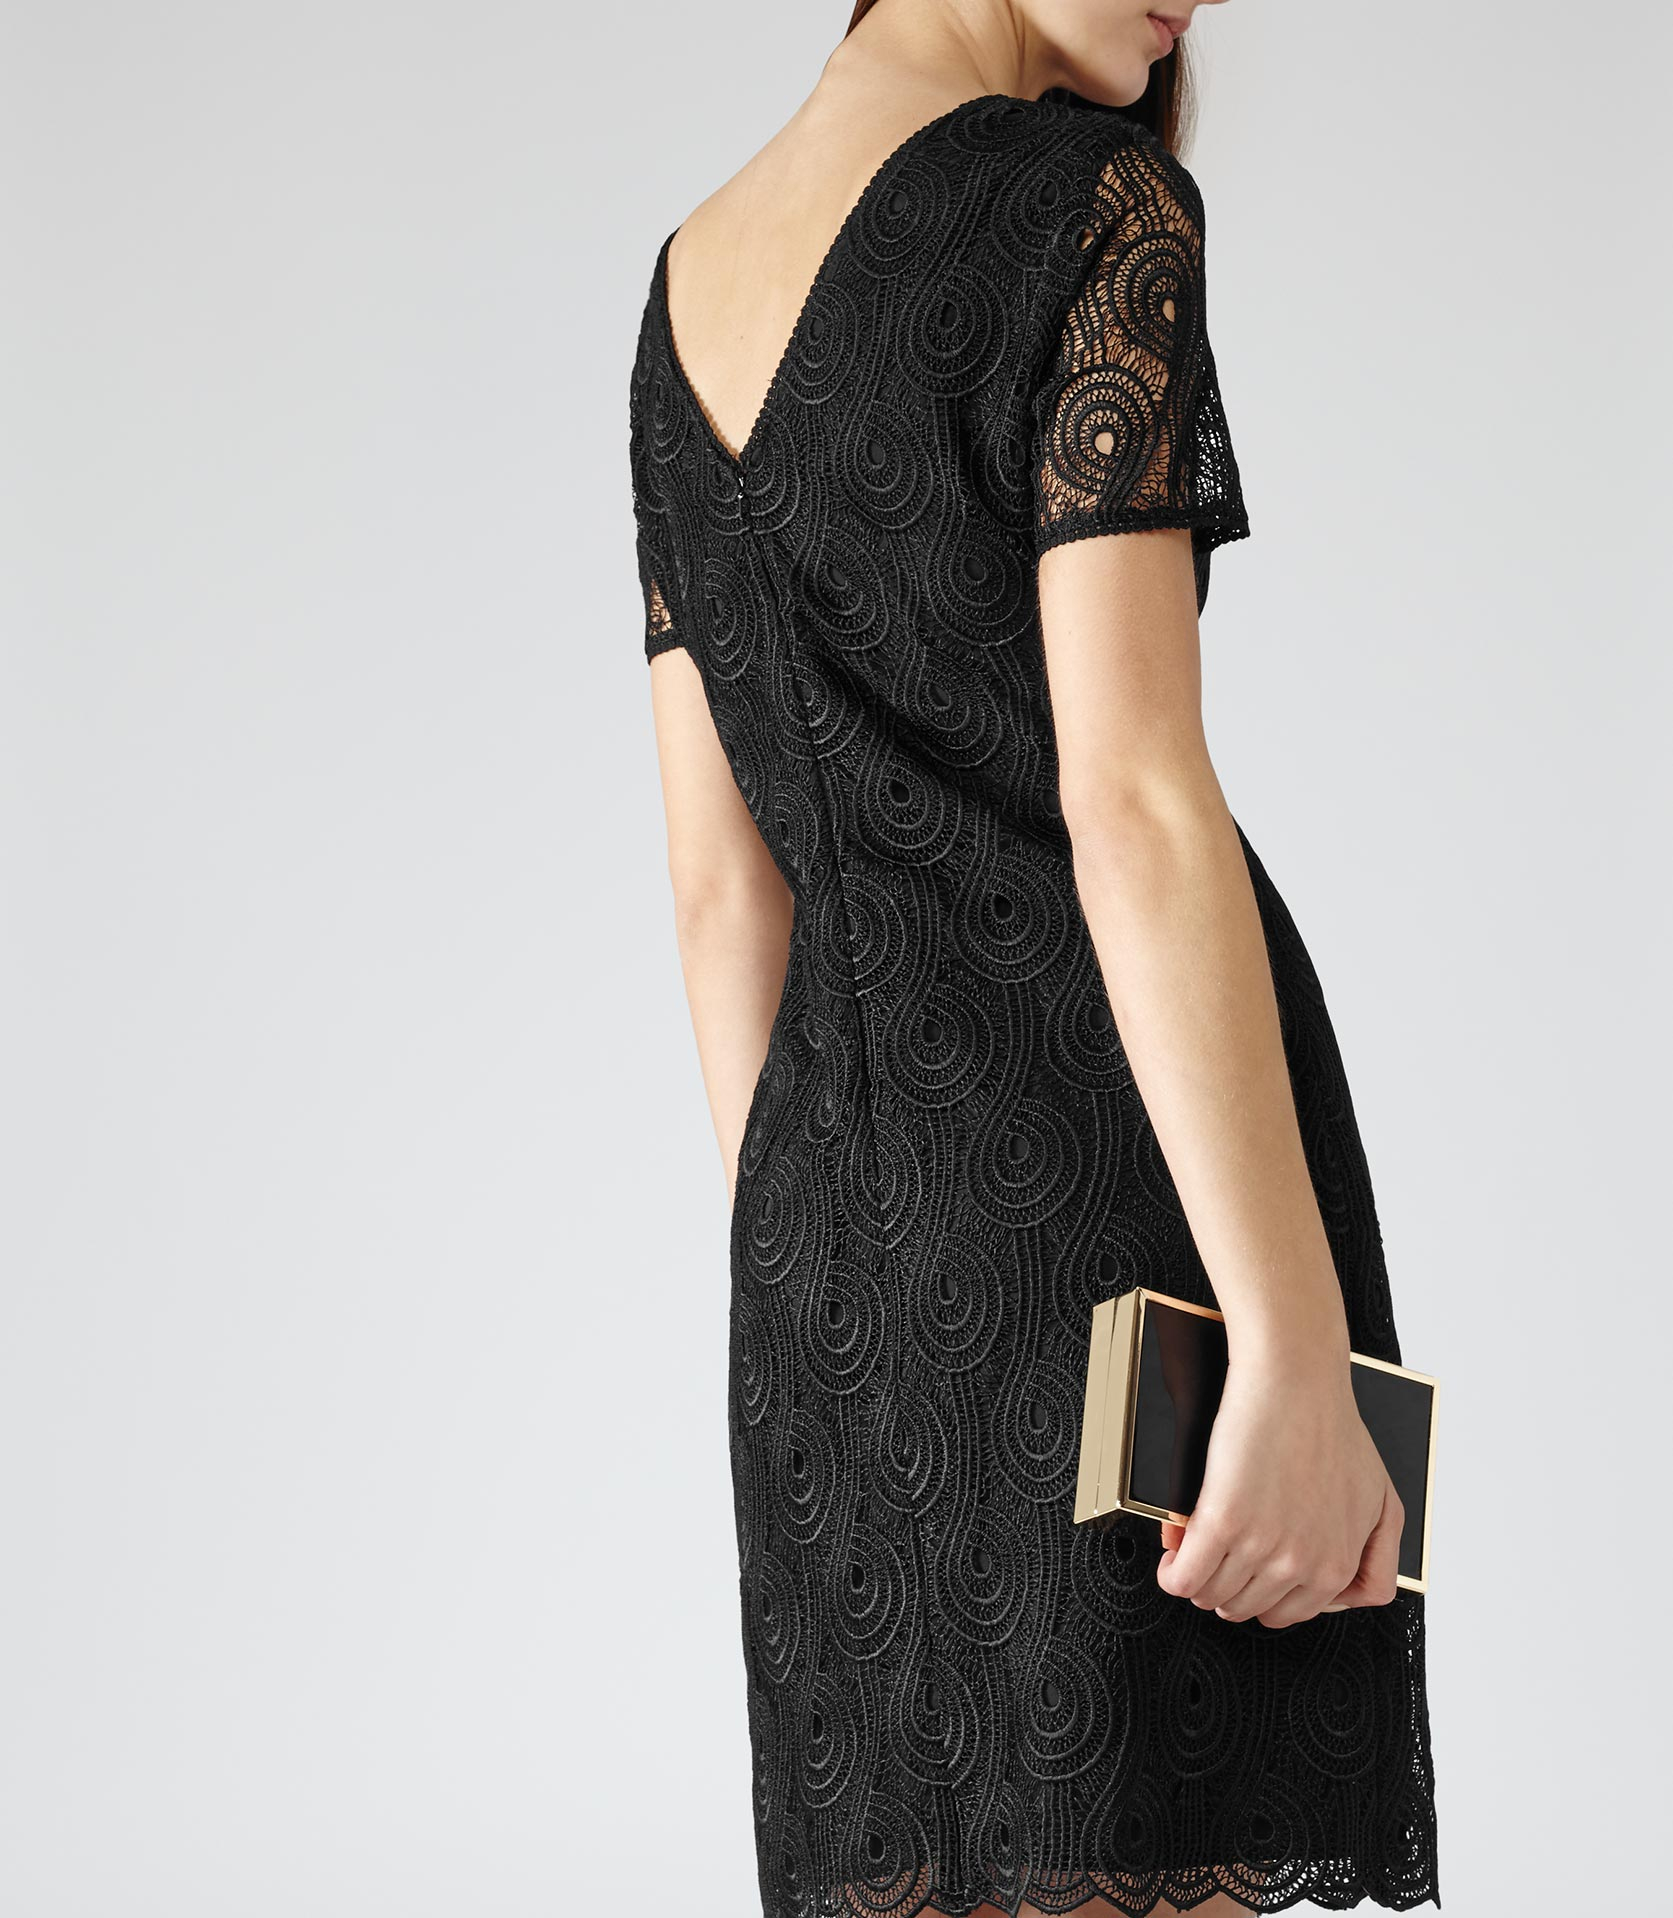 Romy lace dress